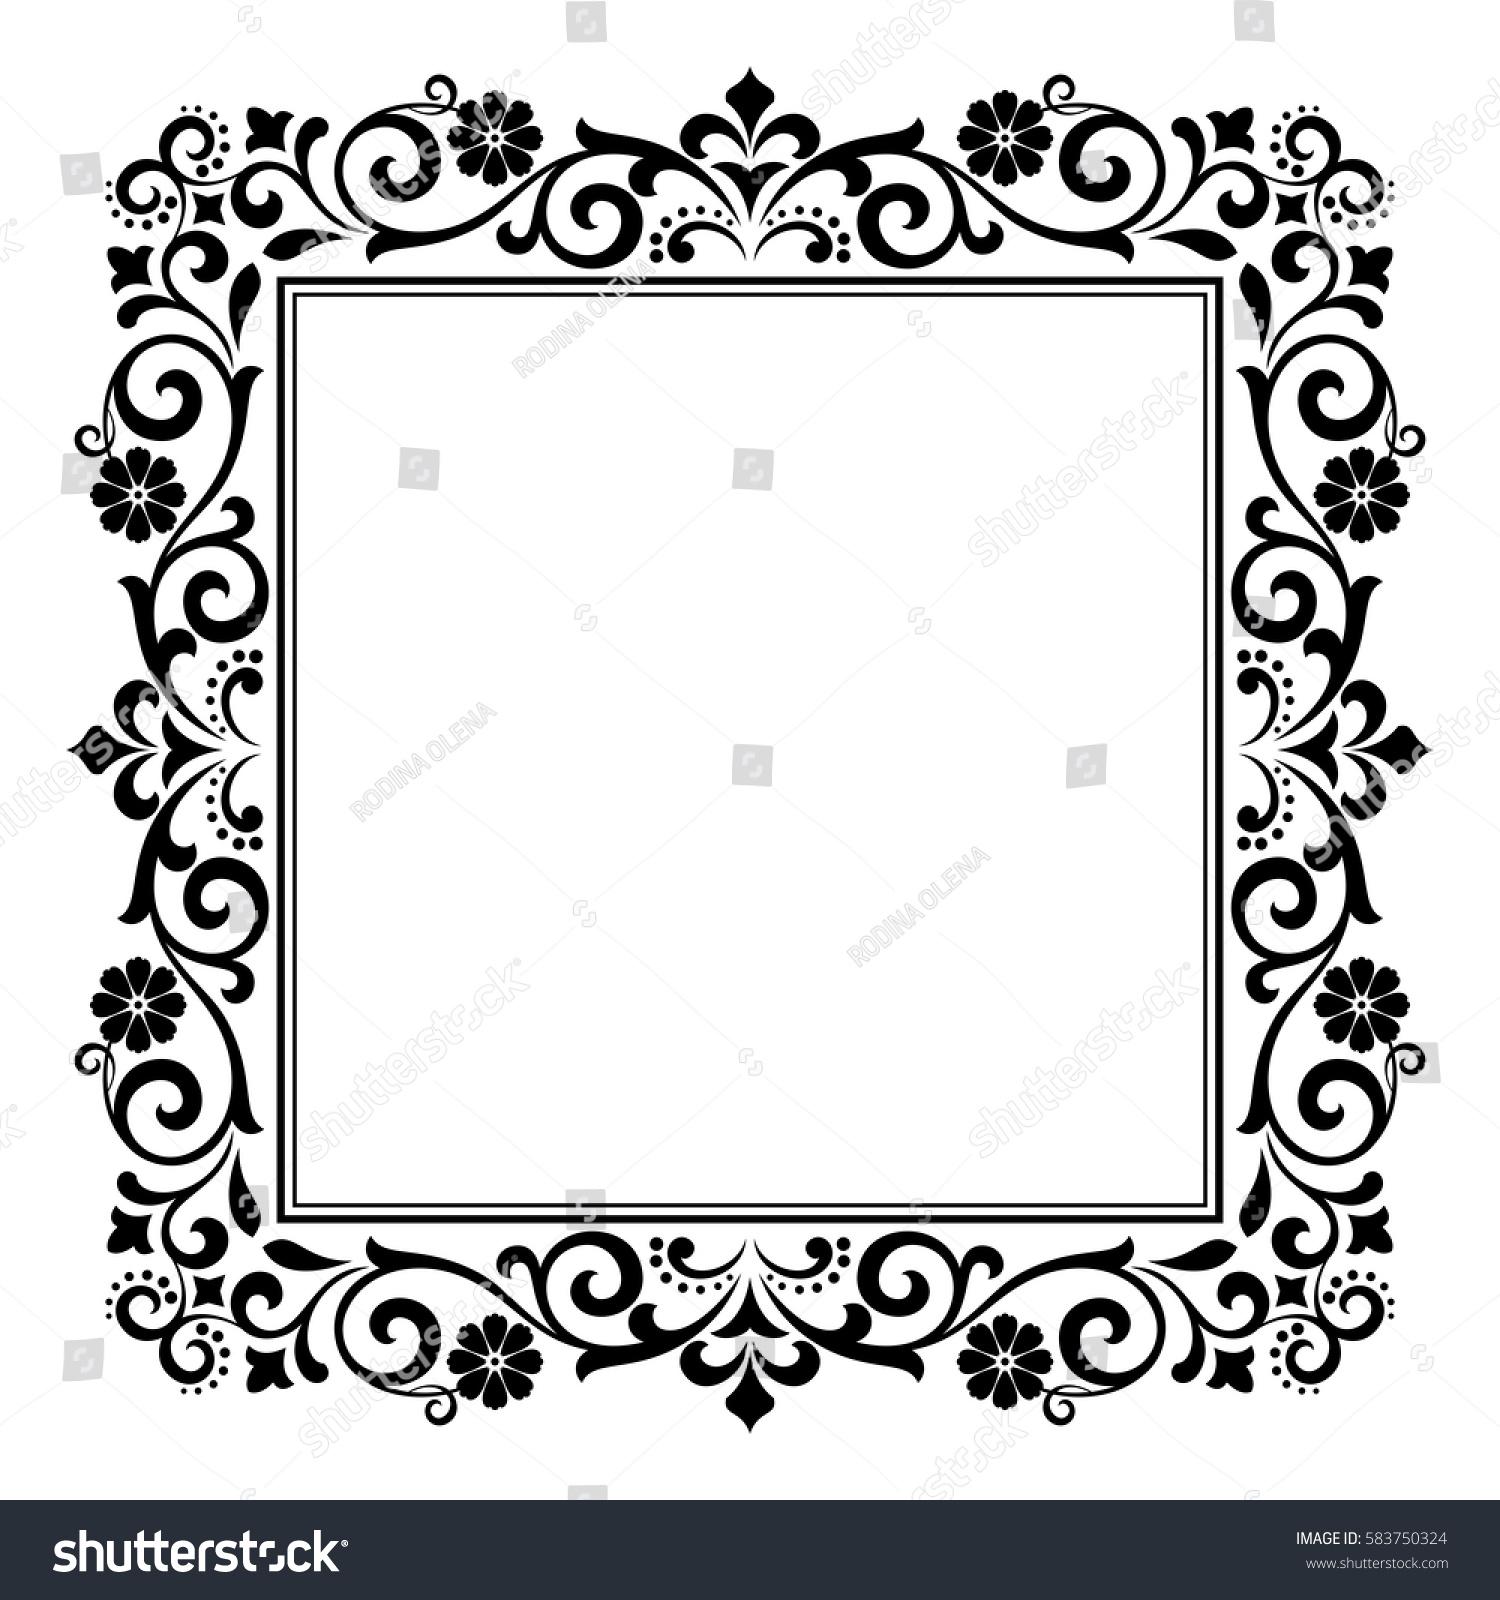 Decorative Line Art Frames Design Template Stock Vector 583750324 ...